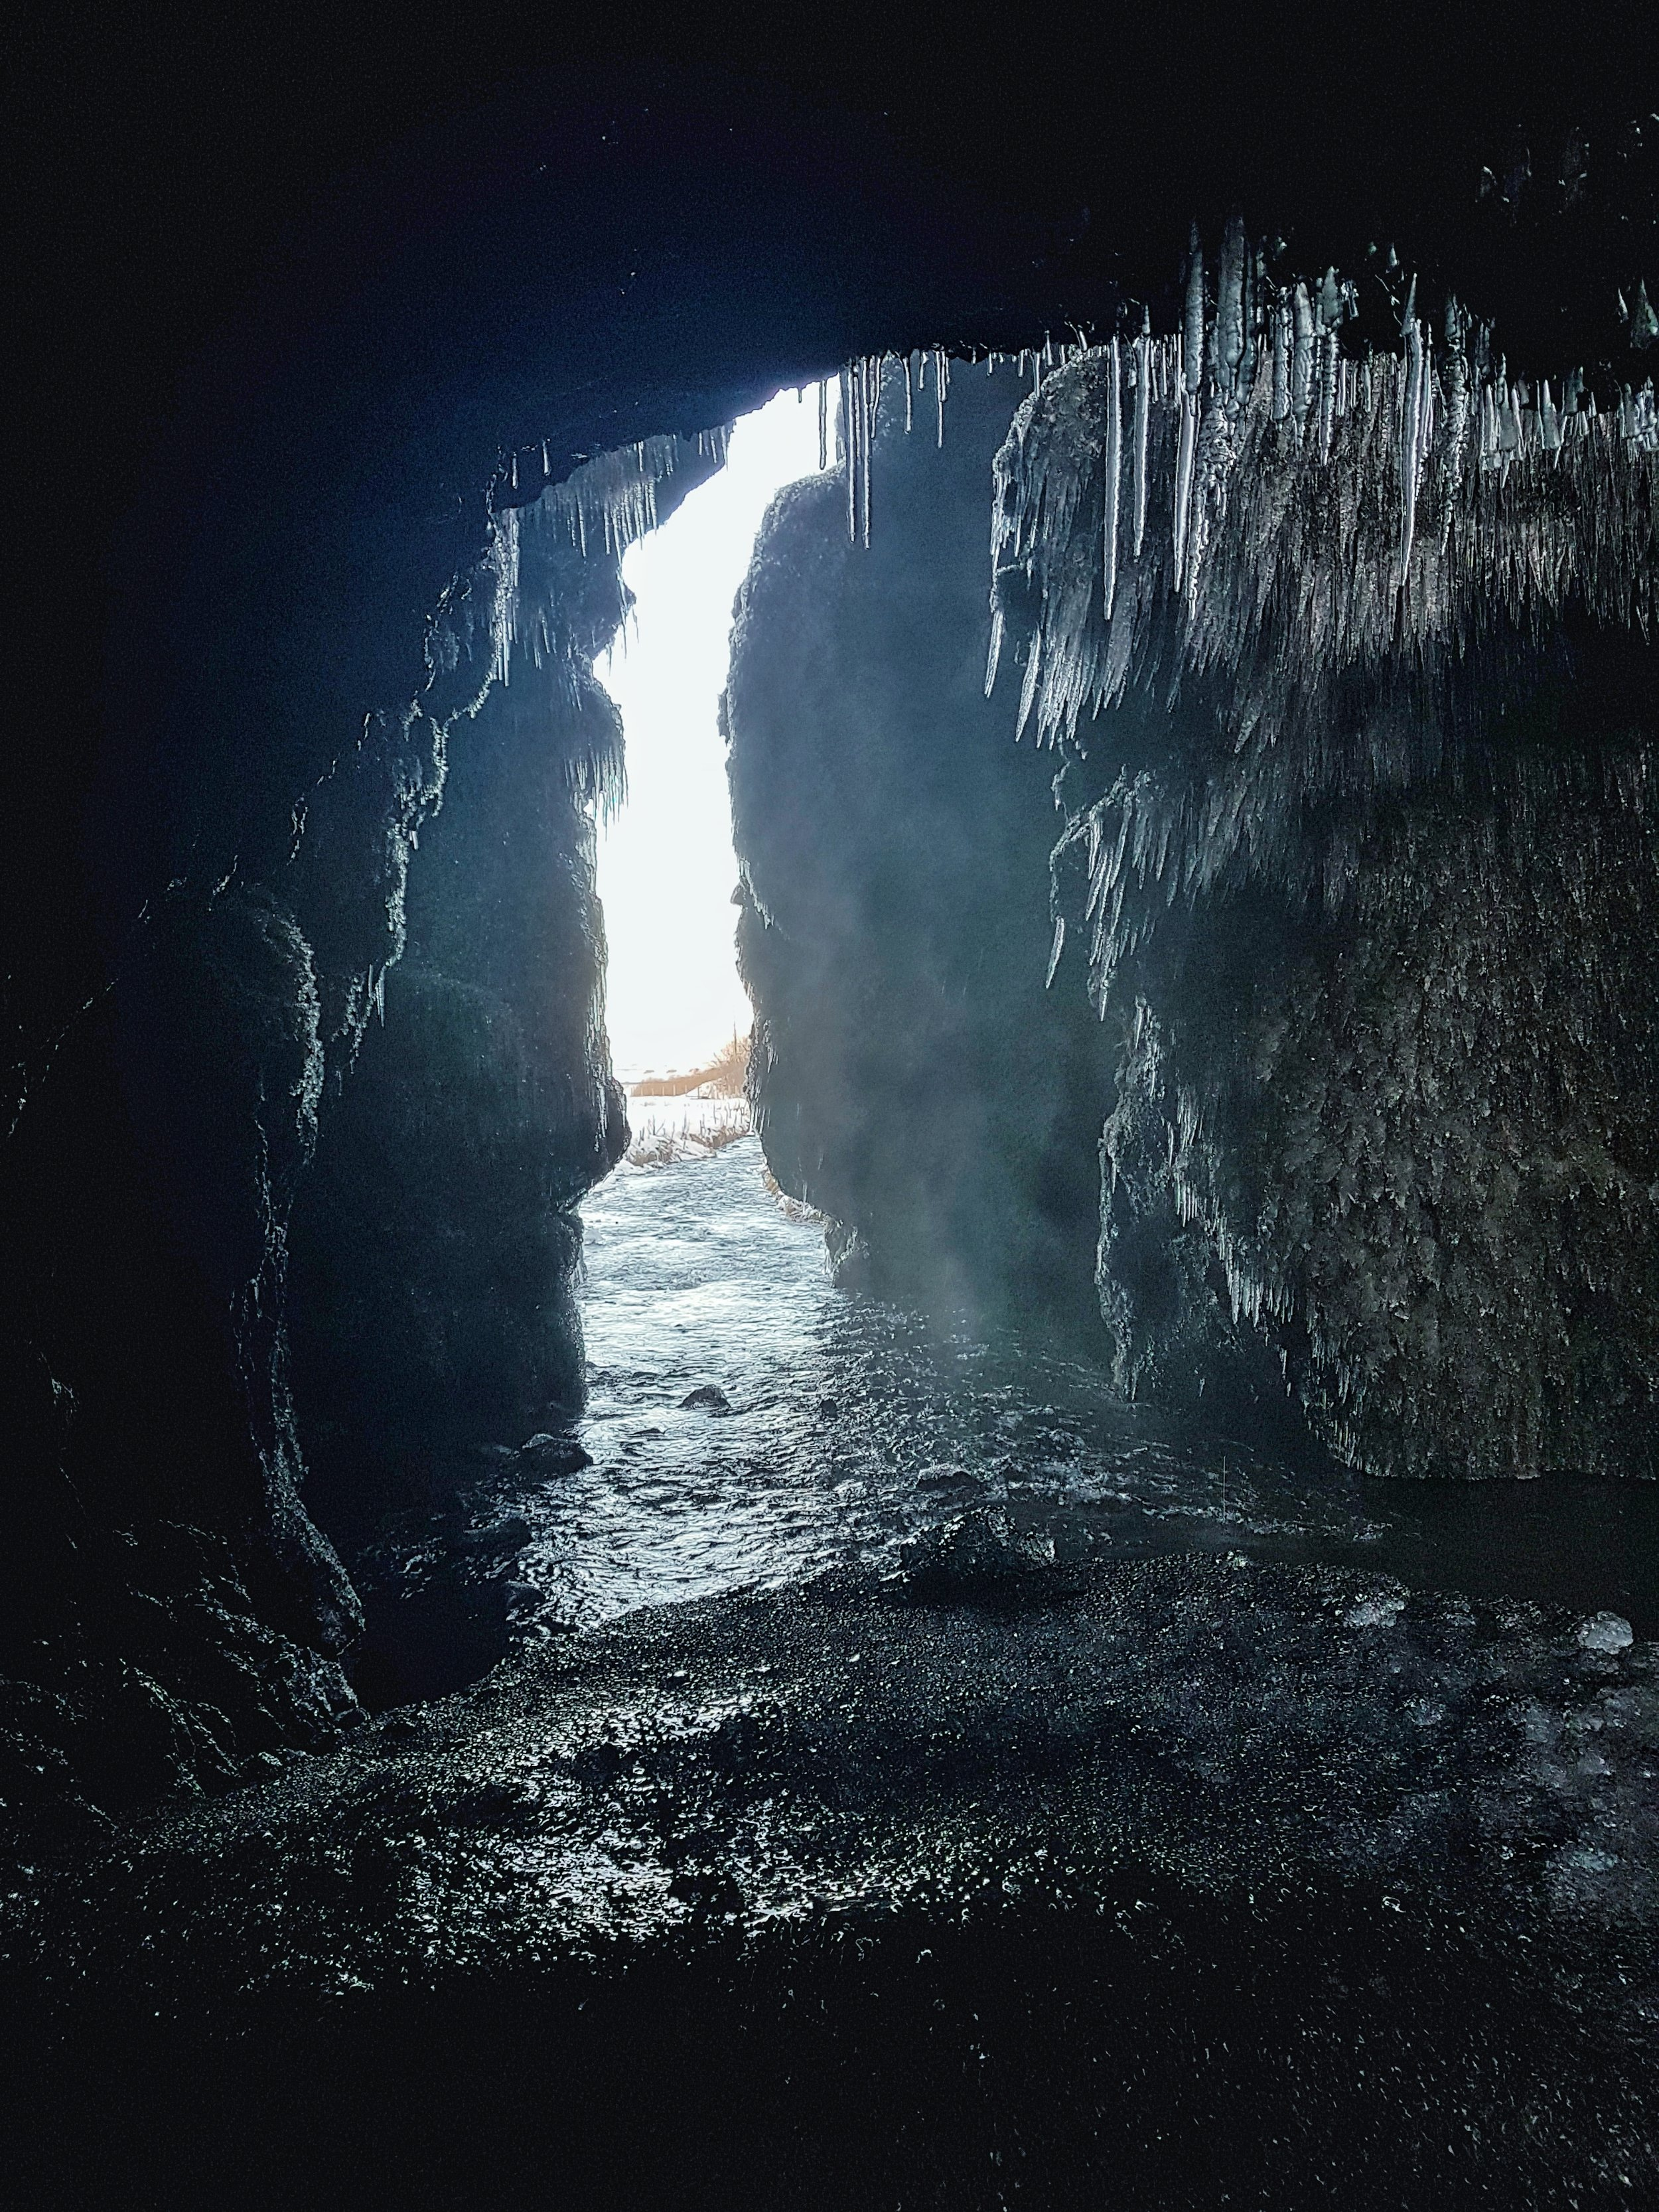 Iceland. snow. travel. adventure. photography. trip. epic landscape. snow. cold. freezing. sunrise. cave mouth.jpg